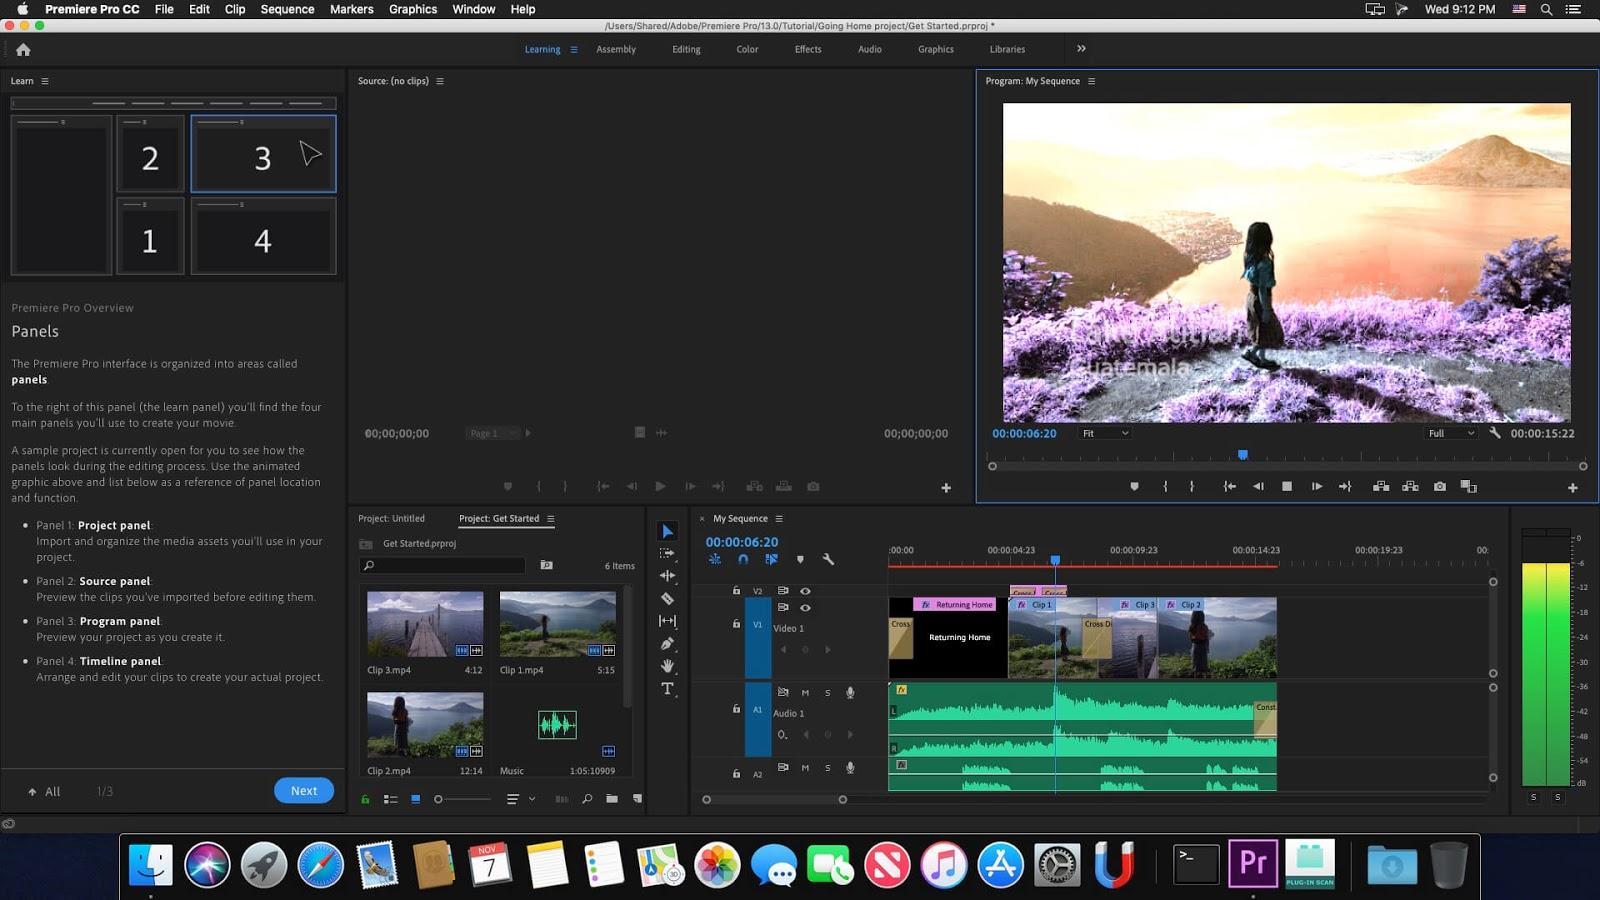 Adobe Premiere Elements 15 For Mac Torrent